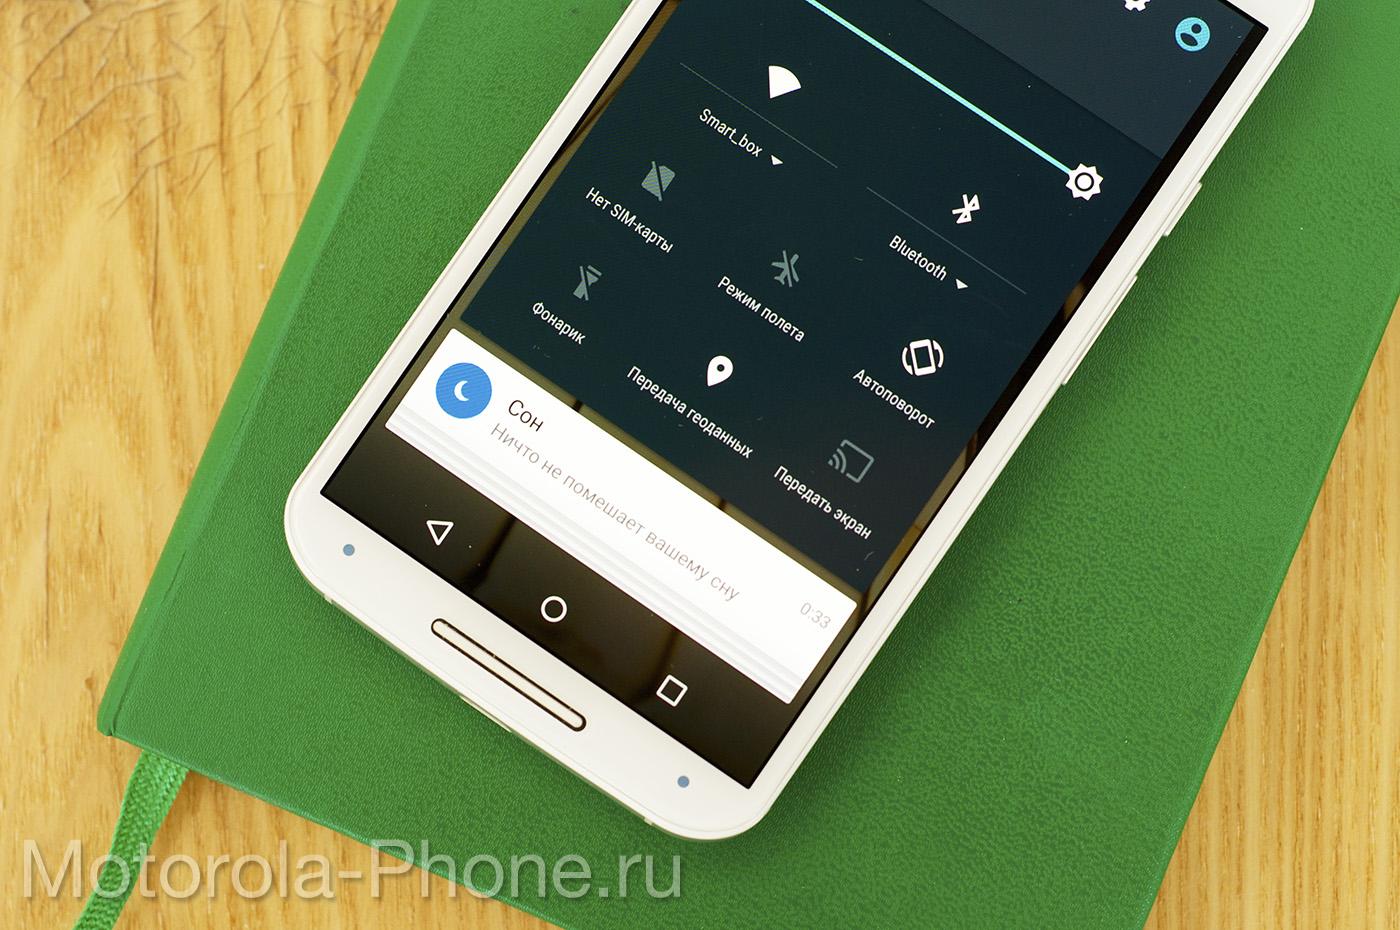 Motorola-Moto-X-2014-Android-5-1-10